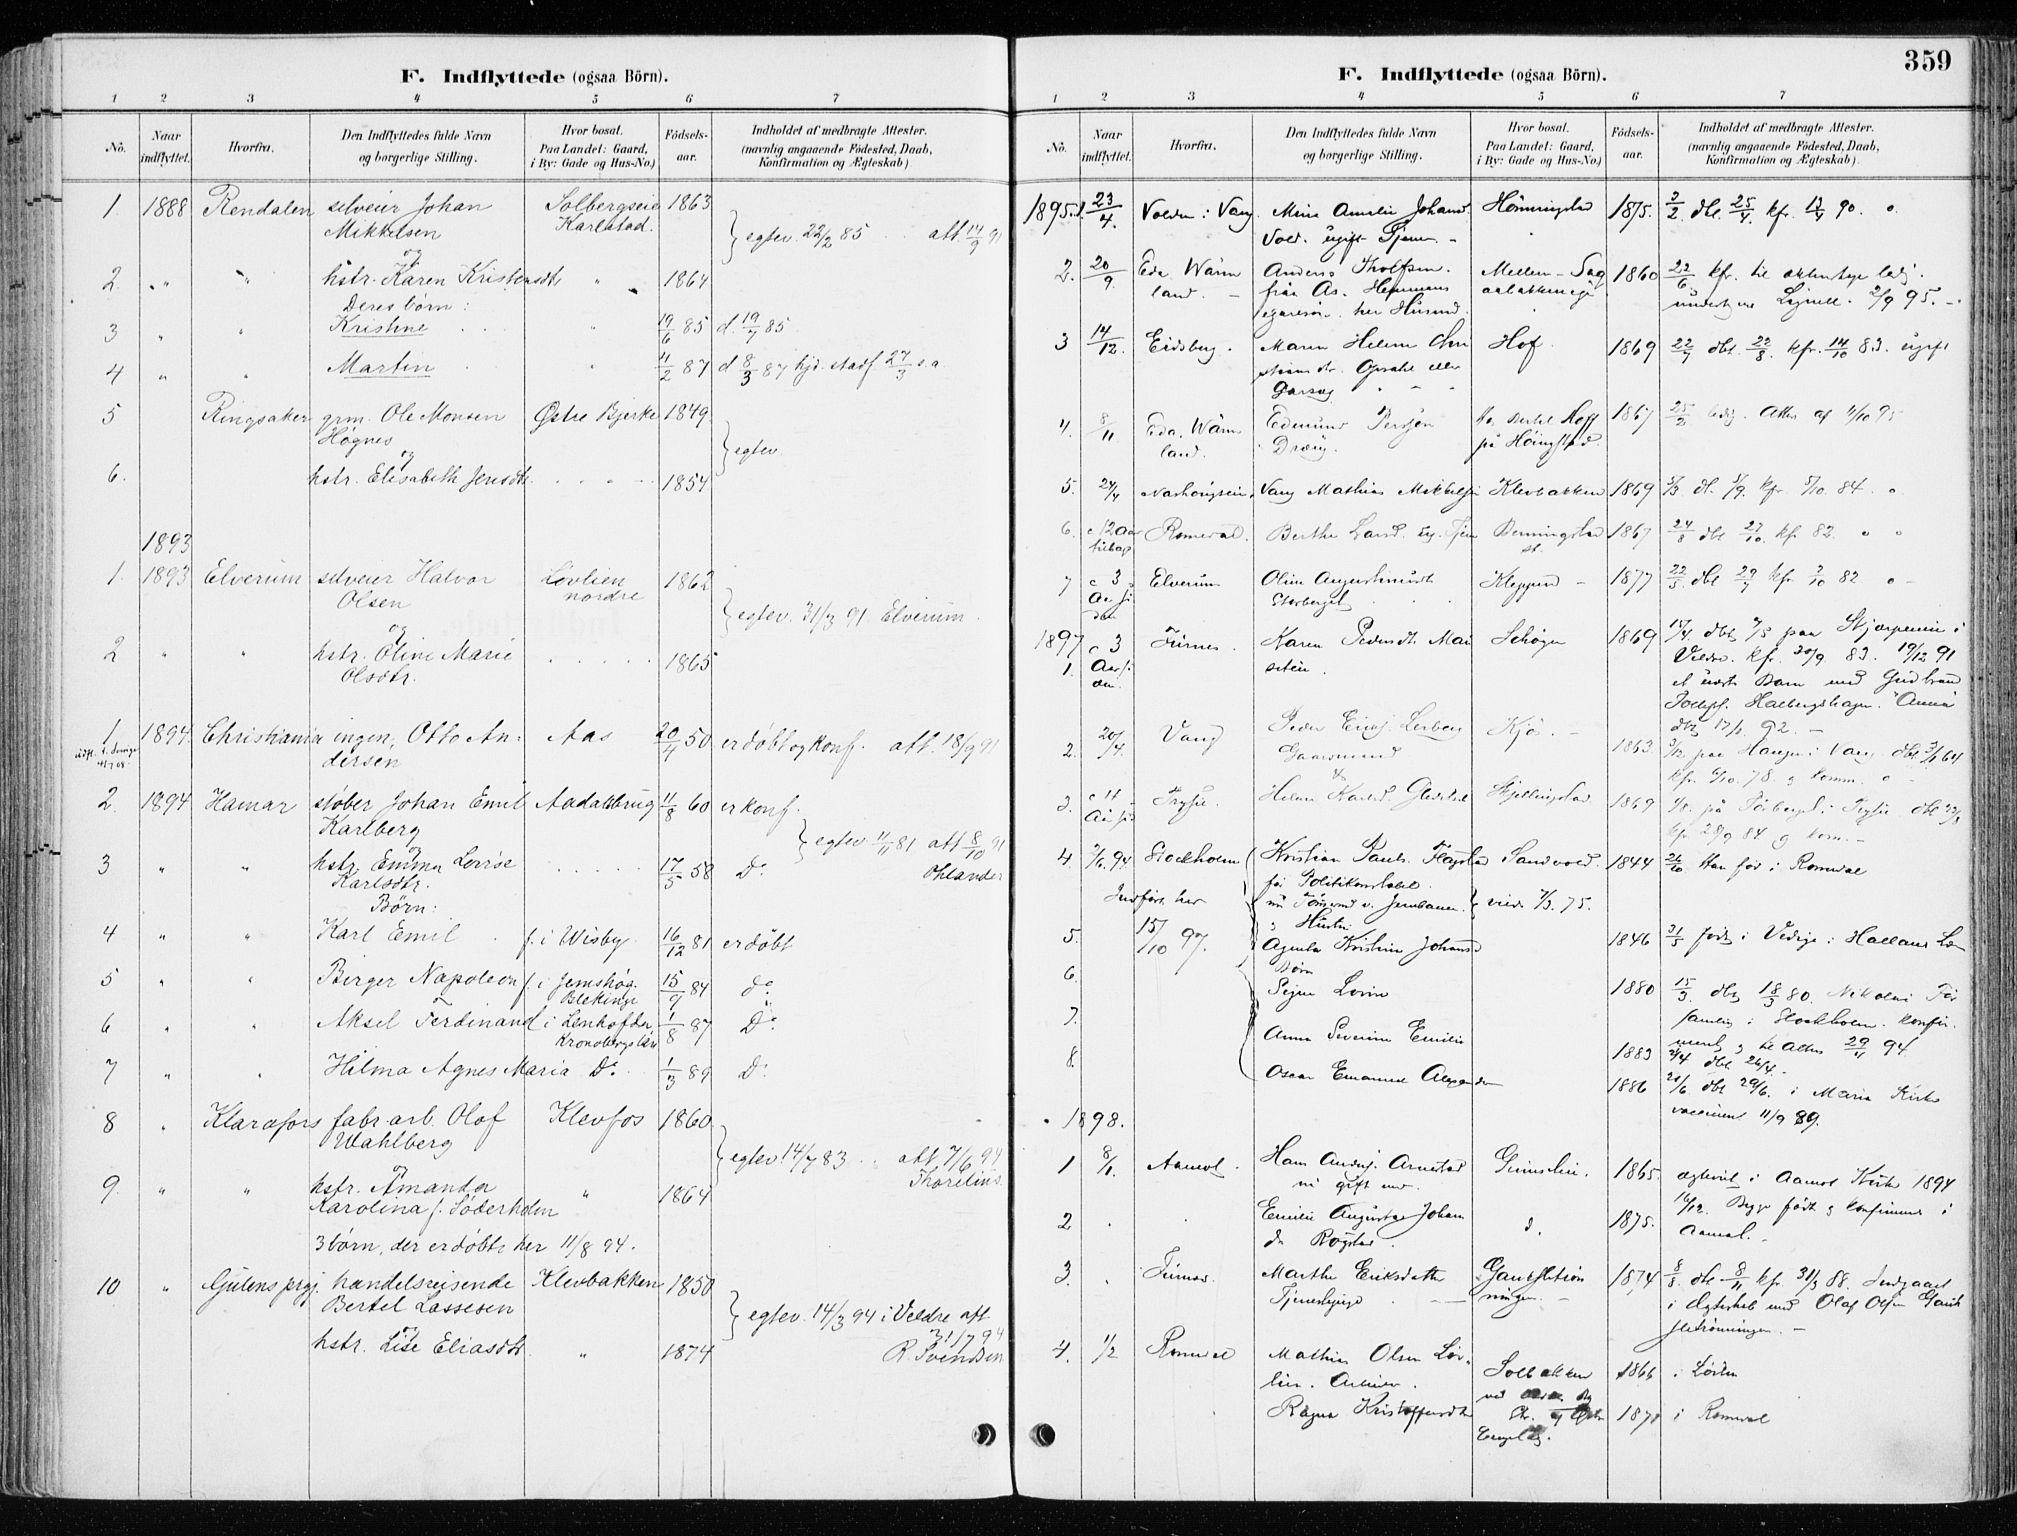 SAH, Løten prestekontor, K/Ka/L0010: Ministerialbok nr. 10, 1892-1907, s. 359